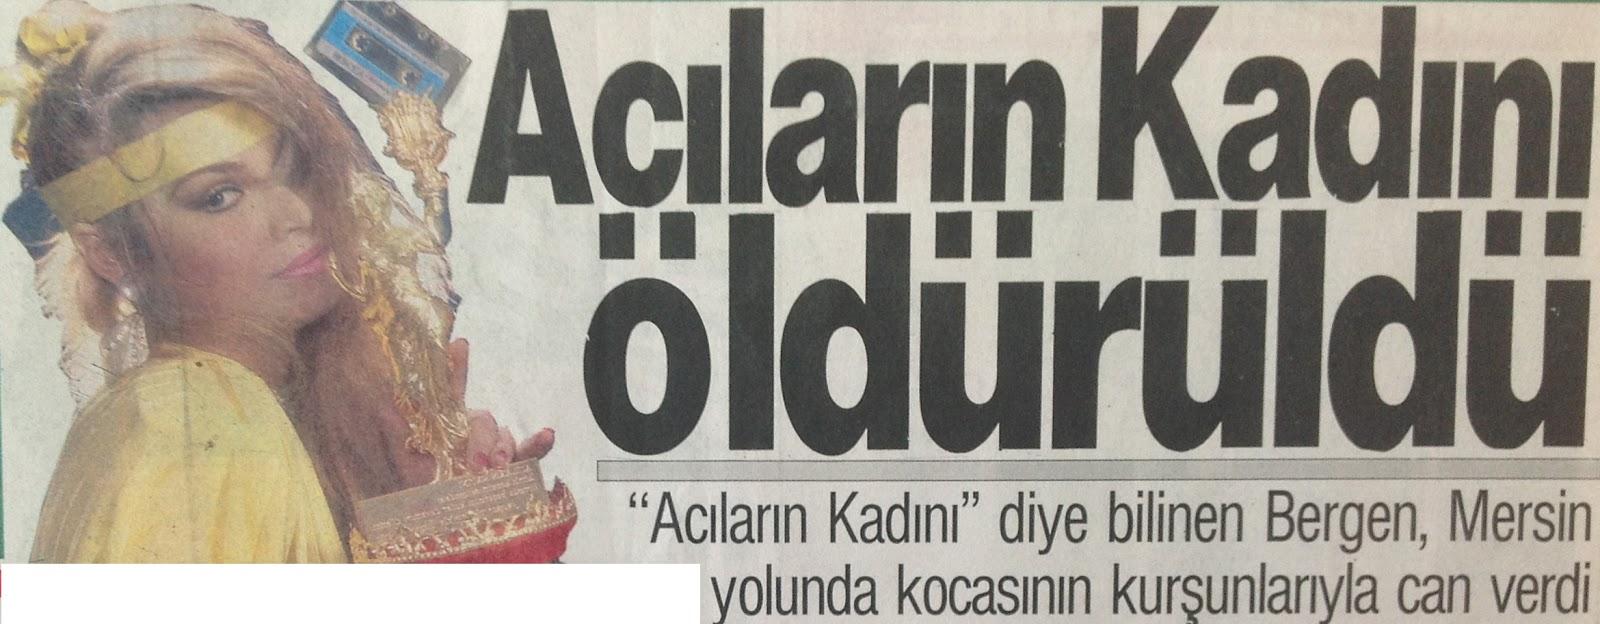 Картинки по запросу bergen türk